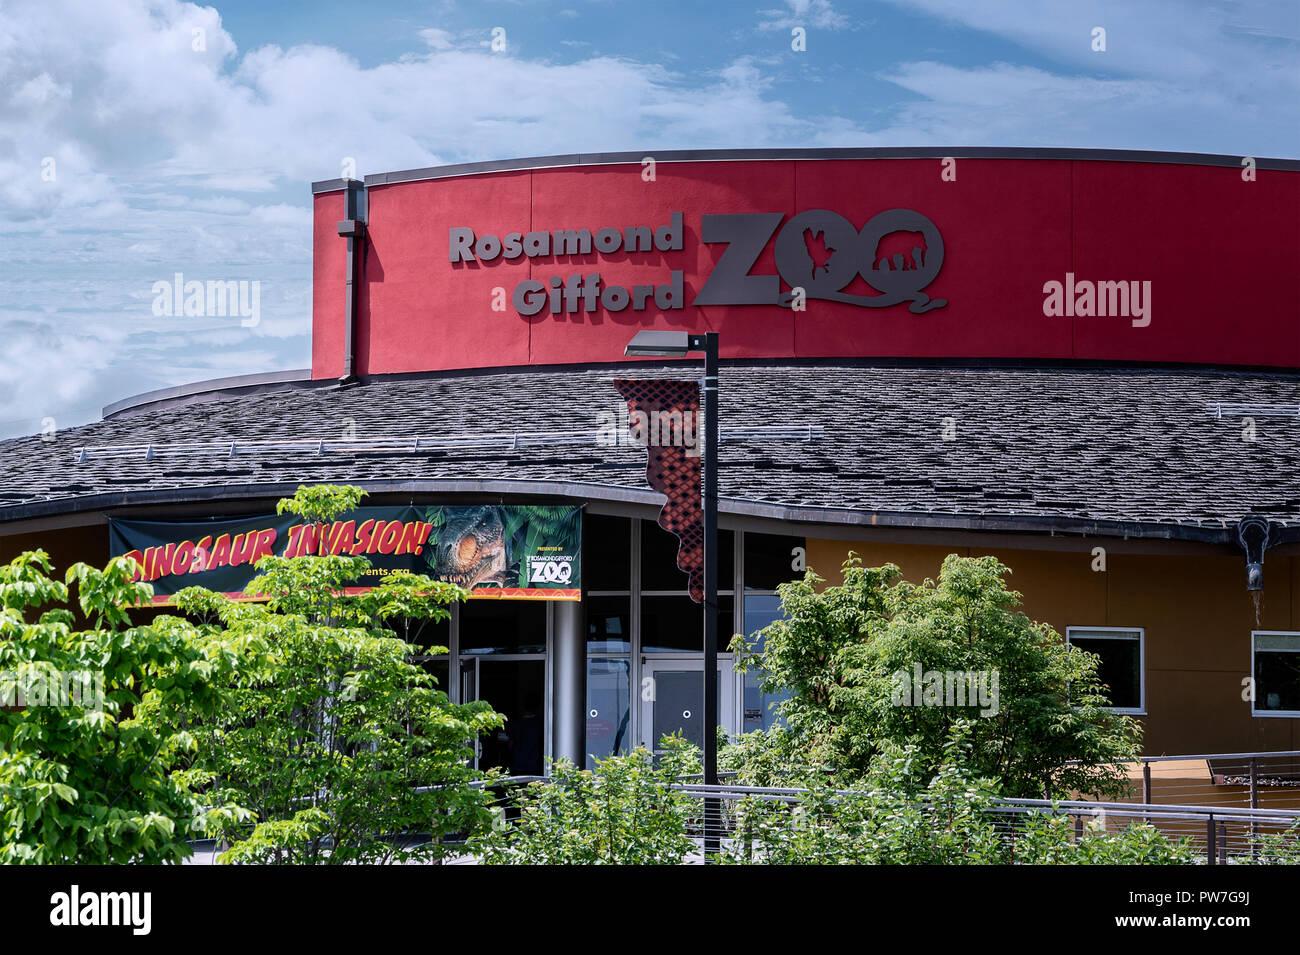 SYRACUSE, NY, USA - MAY 30, 2018: A closeup Shot of The Rosamond Gifford Zoo Building, Located on 1 Conservation Pl, Syracuse, NY 13204. - Stock Image